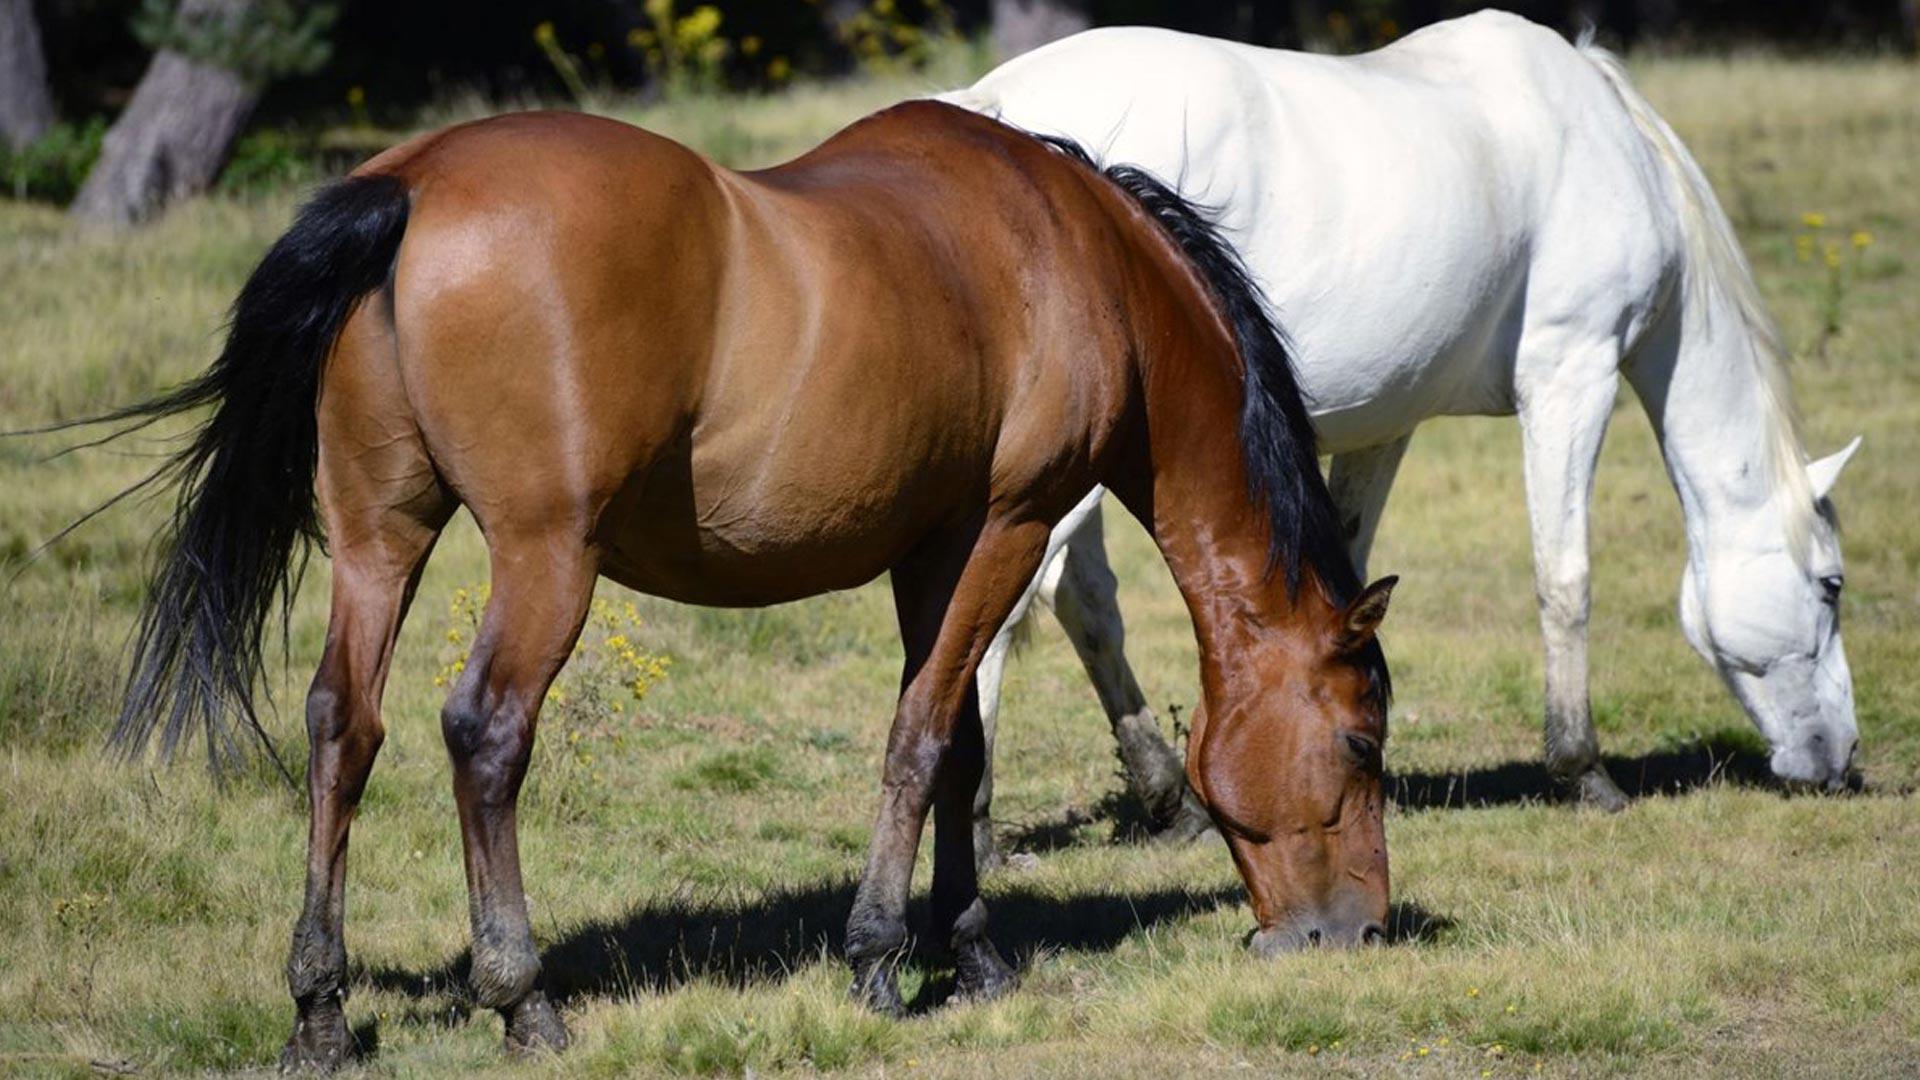 Equine Flu: Thoroughbred Bloodstock Breeding In South Africa